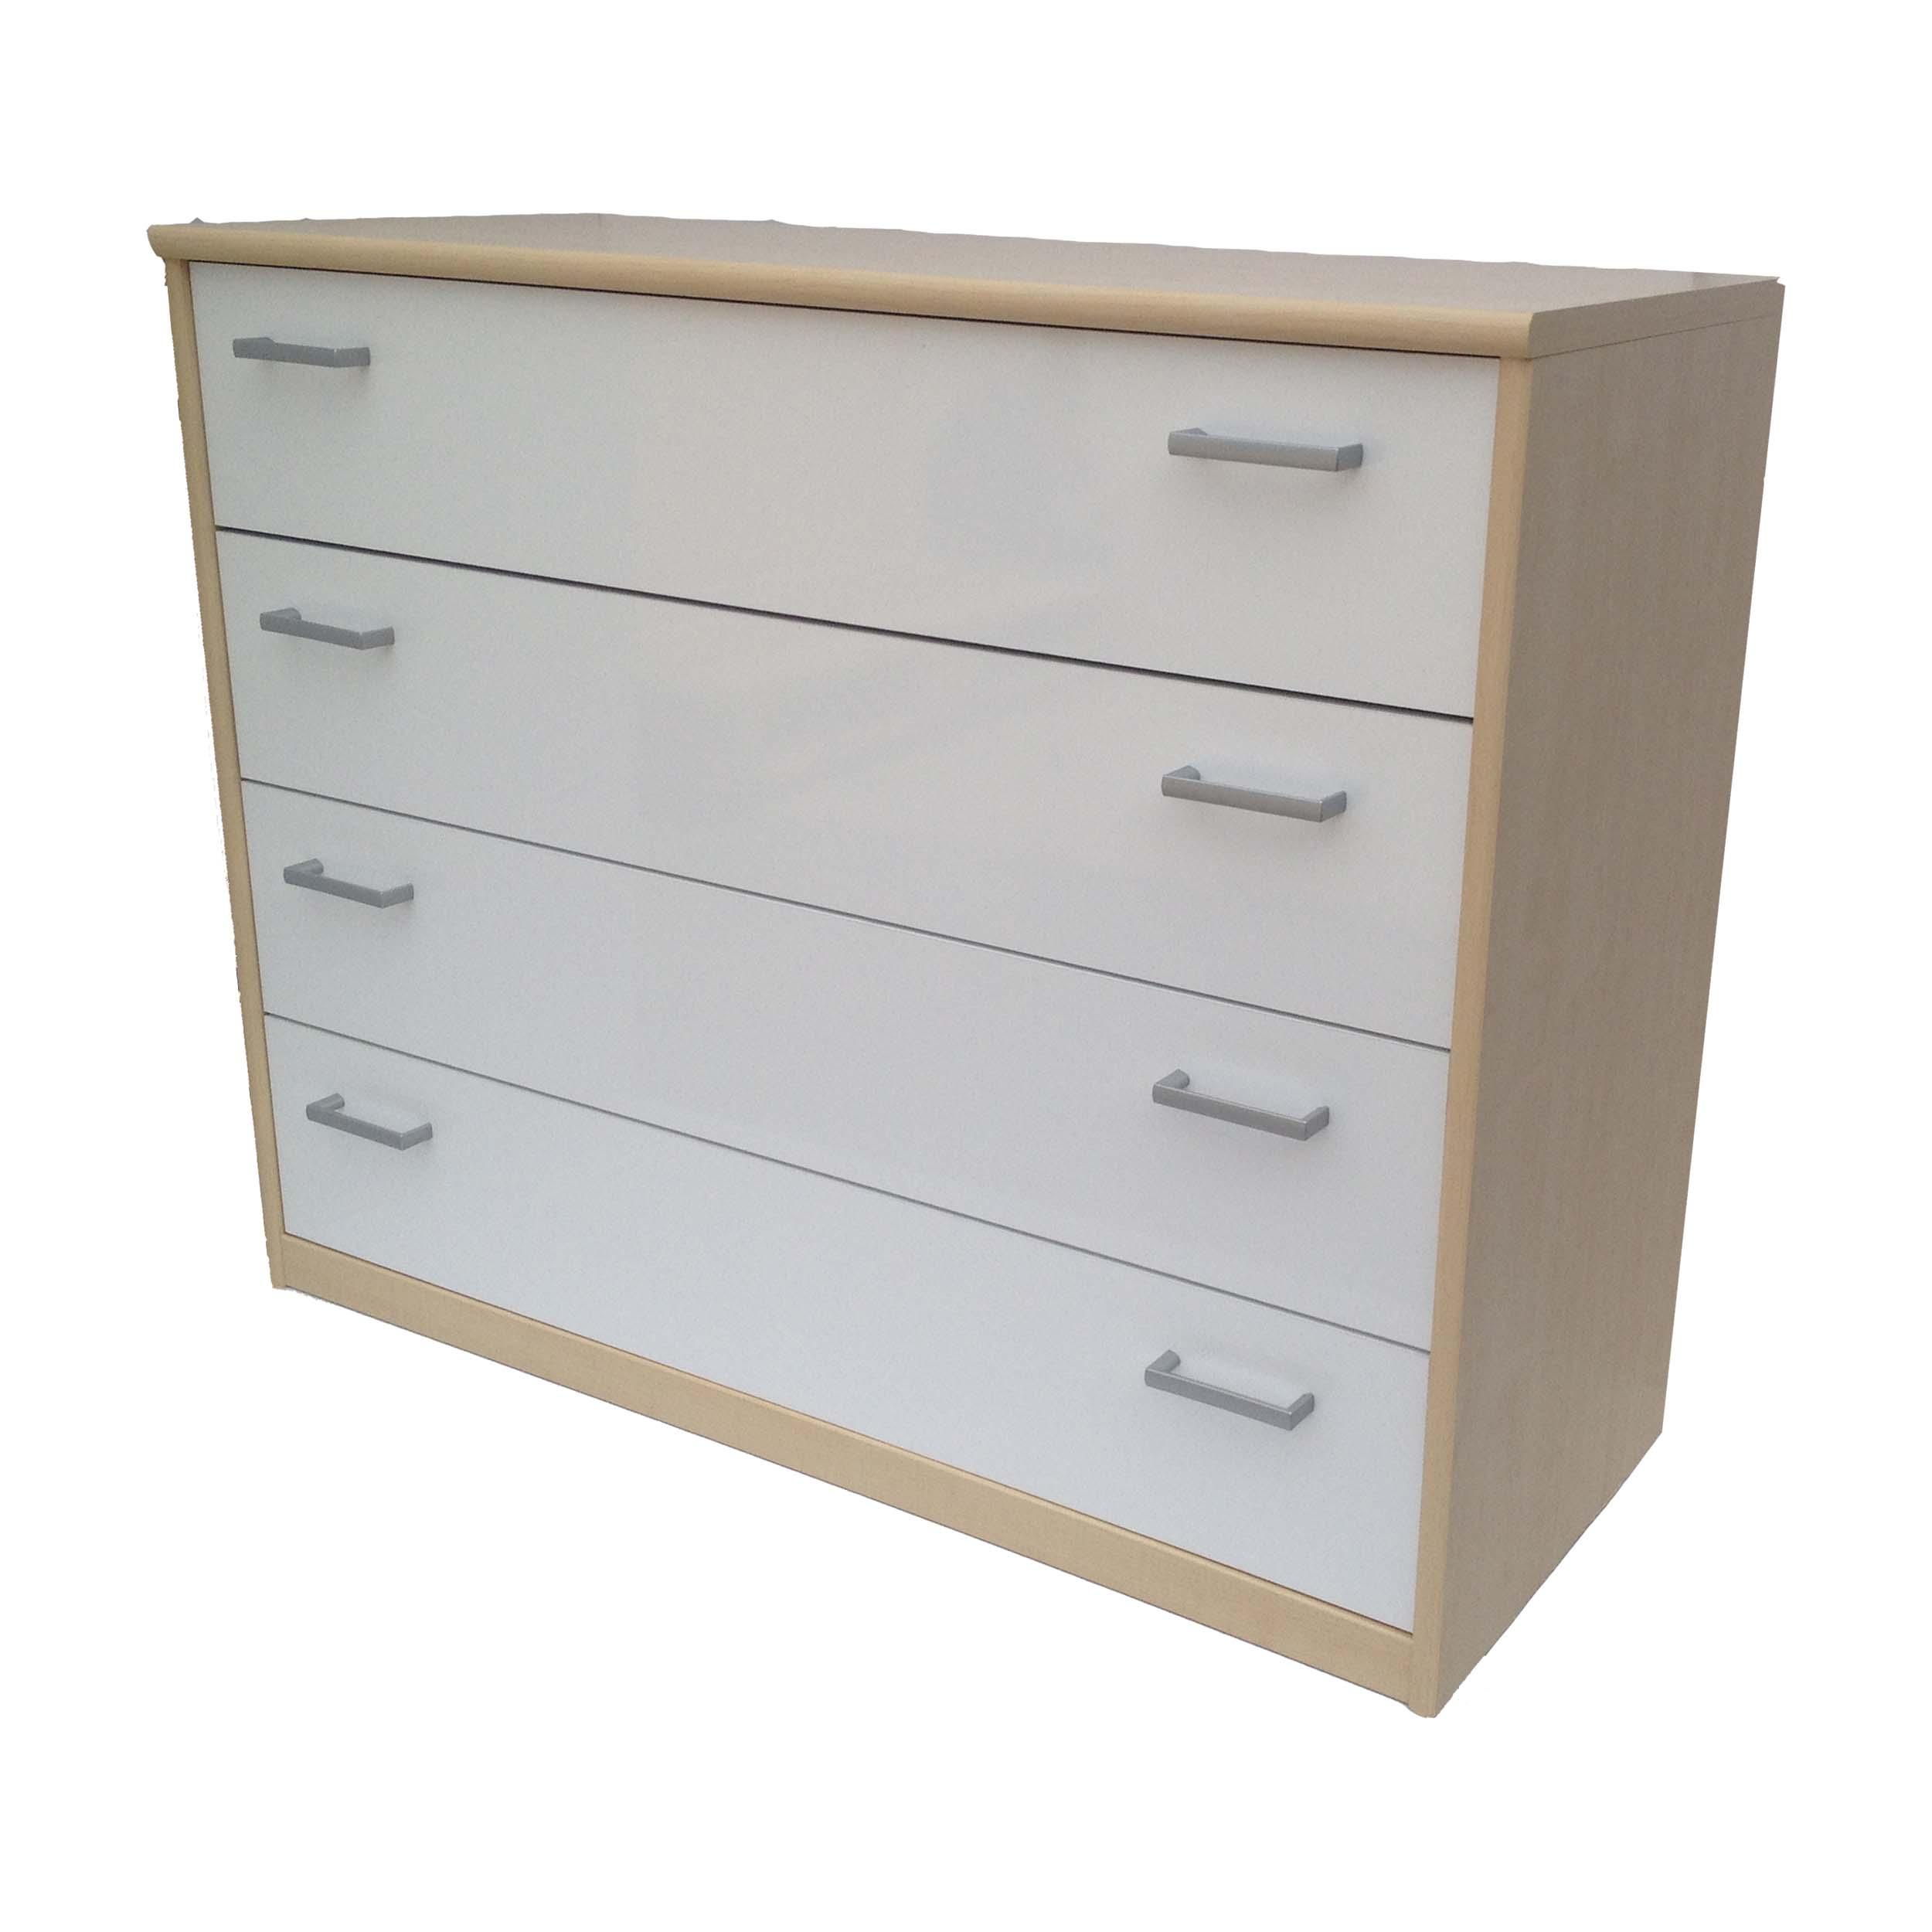 kommode highboard schubladenkommode anrichte 4 schub ahorn. Black Bedroom Furniture Sets. Home Design Ideas